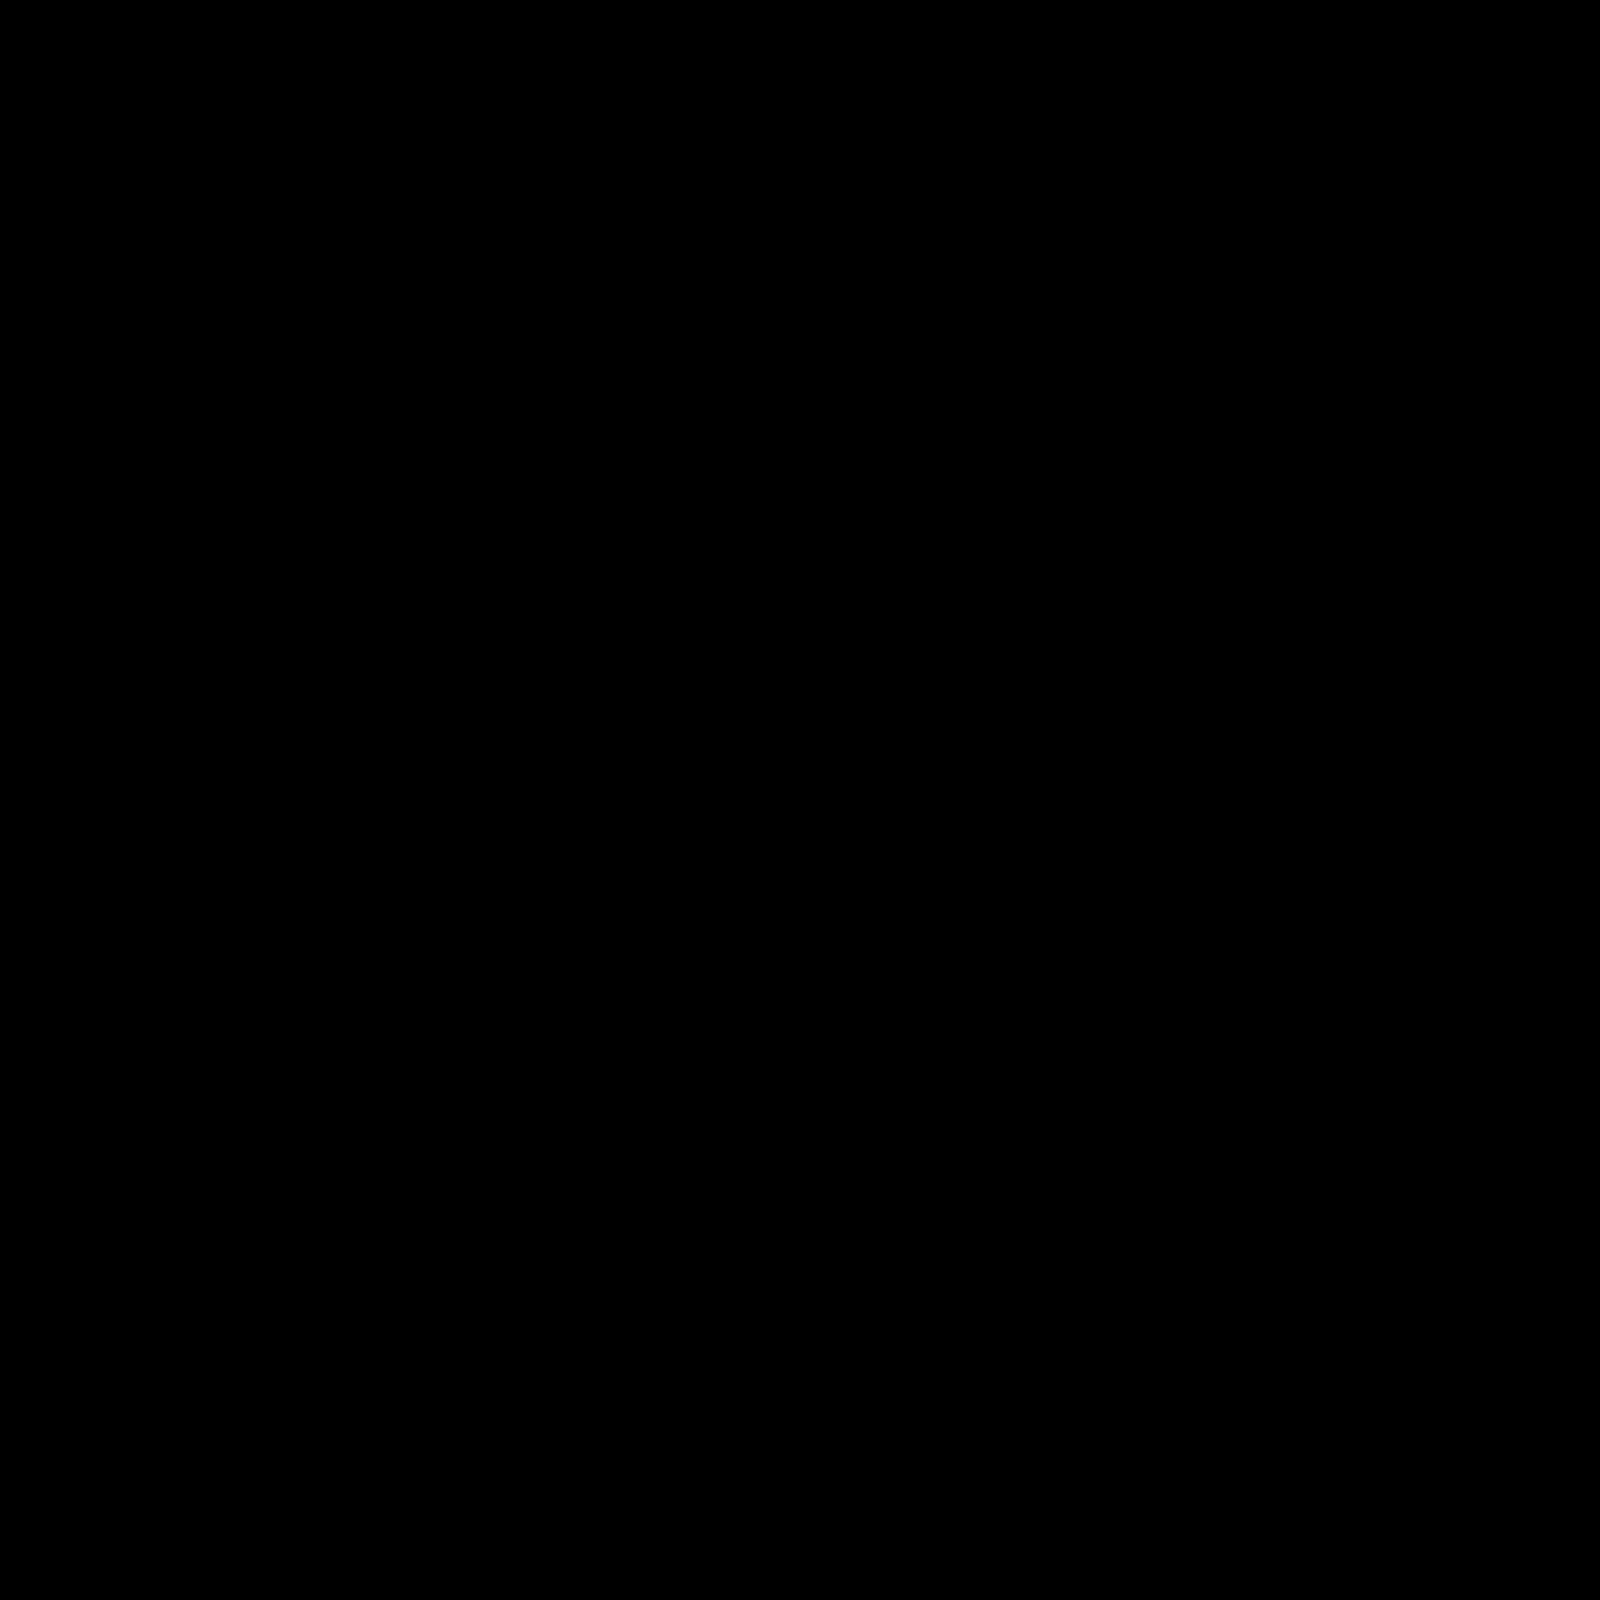 Kabel internetowy icon